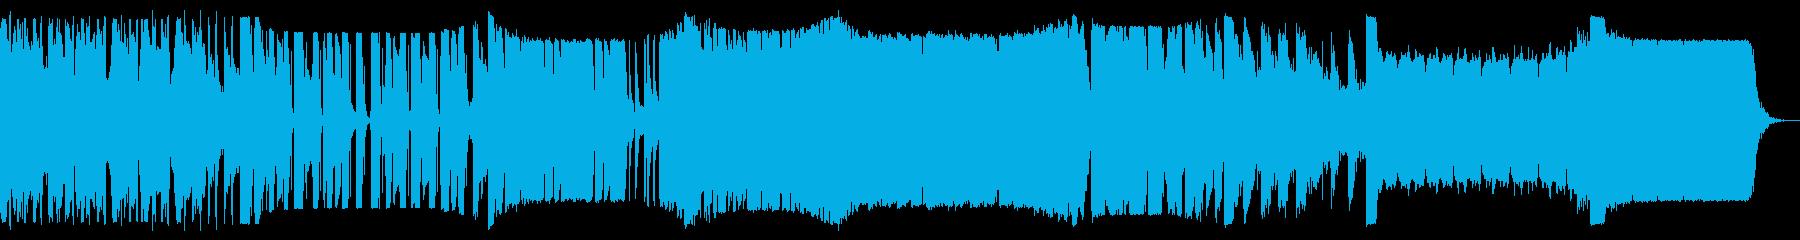 FliktraxのHit It H...の再生済みの波形